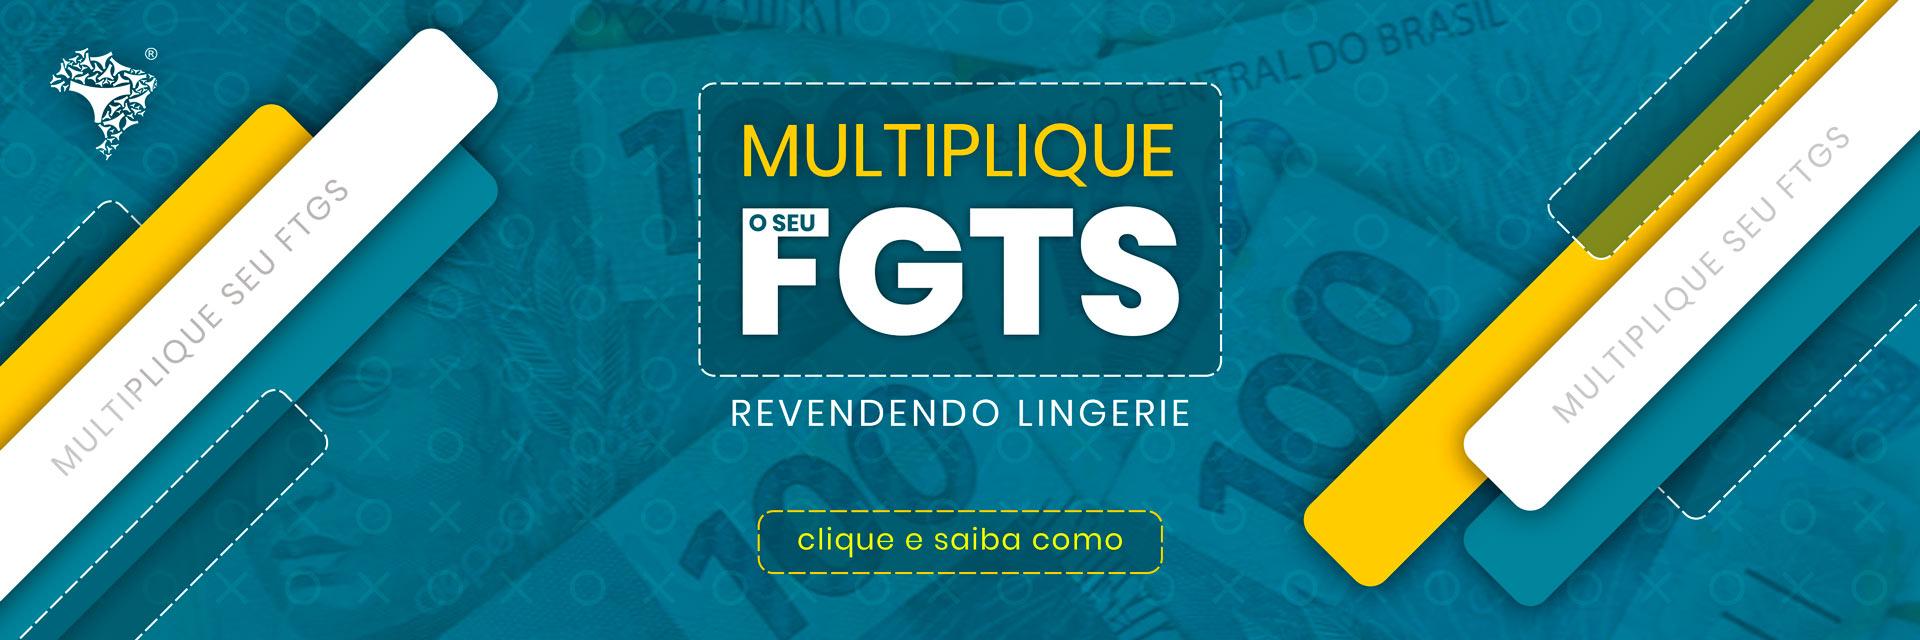 Multiplique seu FGTS